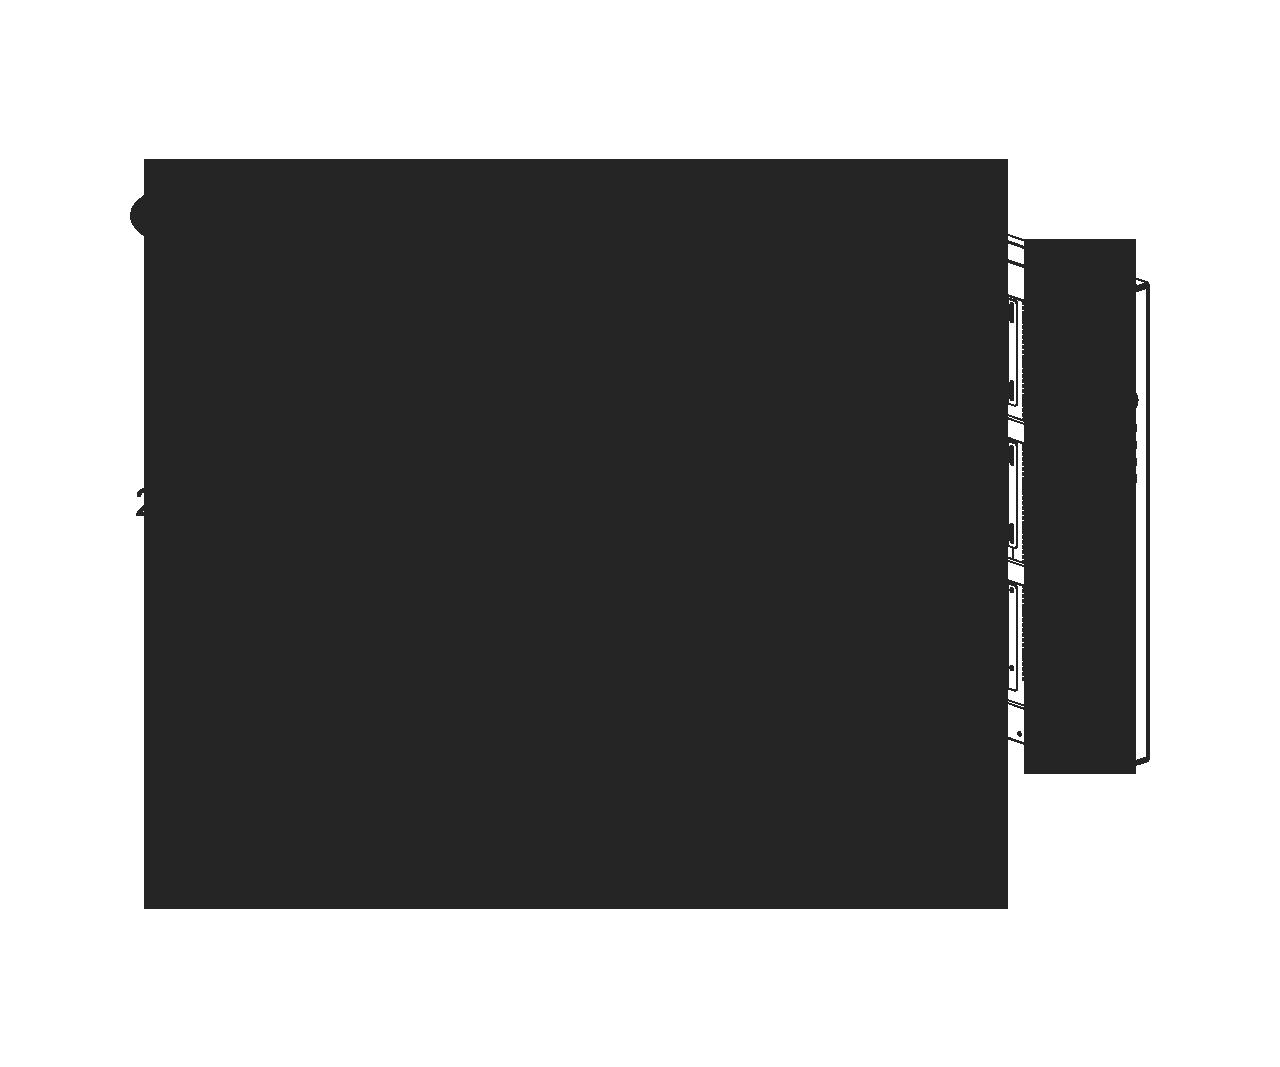 Case Thermaltake Core P3 Tempered Glass Edition